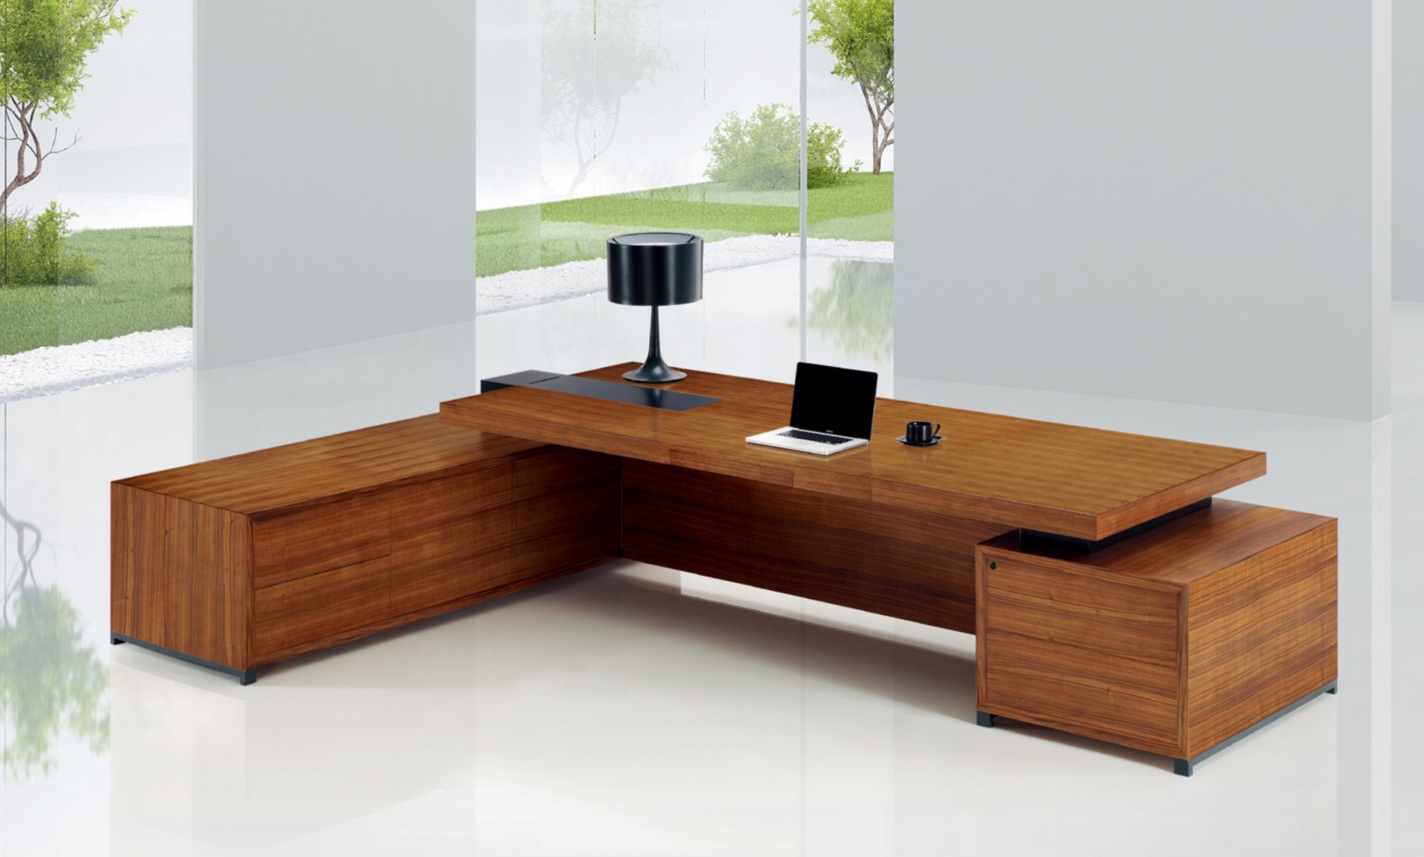 office desk europalets endsdiy. Modern Office Chairs Johannesburg - Best Led Desk Lamp Check More At Http://www.sewcraftyjenn.com/modern-office-chairs-johannesburg/   Pinterest Europalets Endsdiy